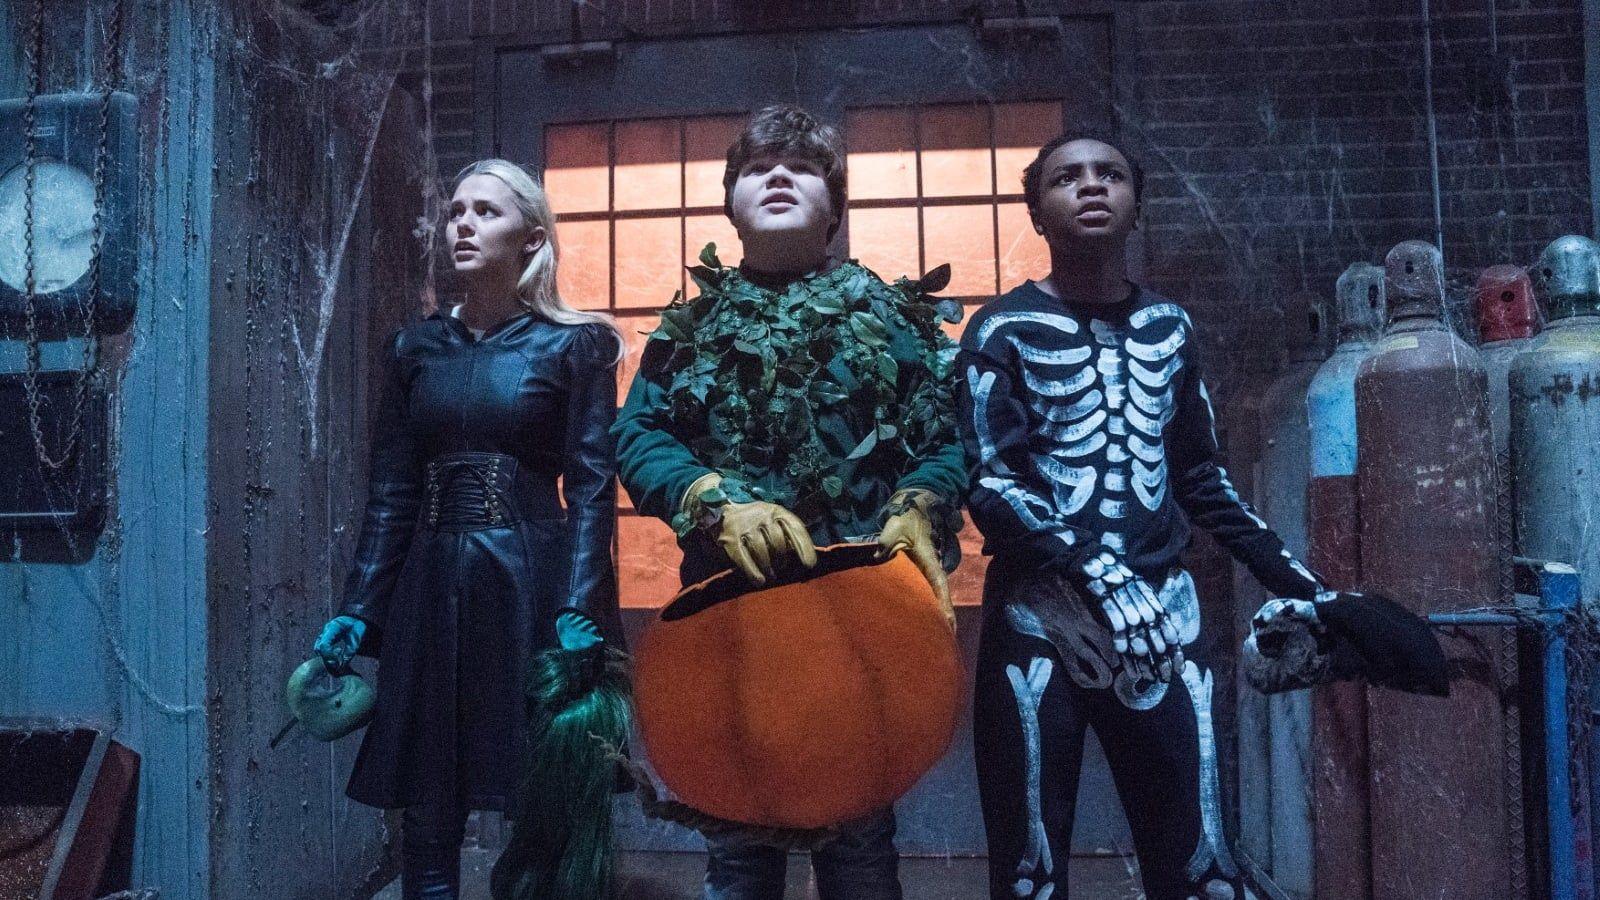 A Horrorregenyironak Van Egy Nagy Titka Fantaziajanak Meghokkento Es Hatborzongato Szulottei Eletre Kelnek K Halloween Full Movie Halloween Movies Goosebumps